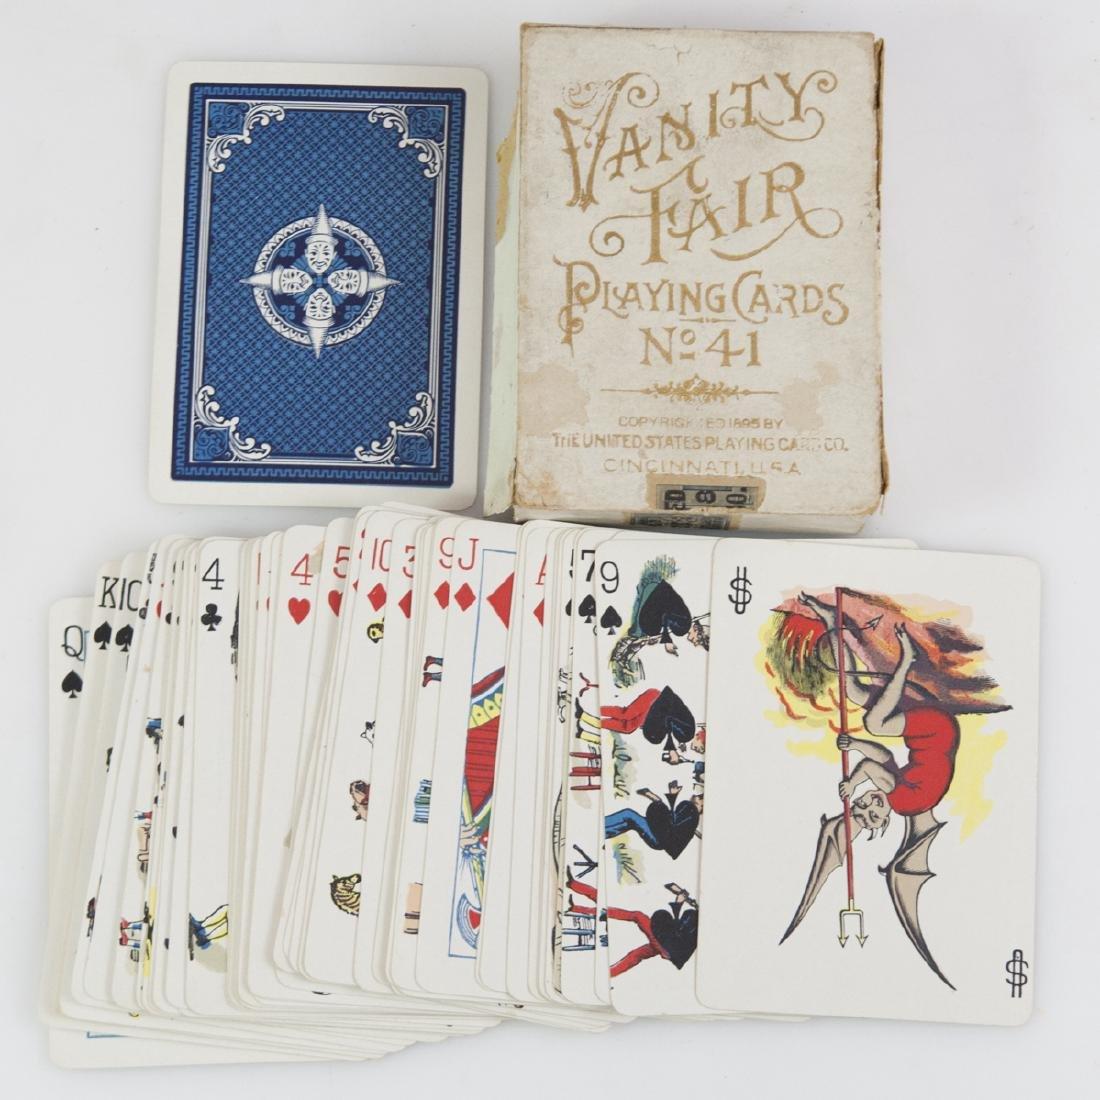 1895 Vanity Fair No.41 Playing Card Deck